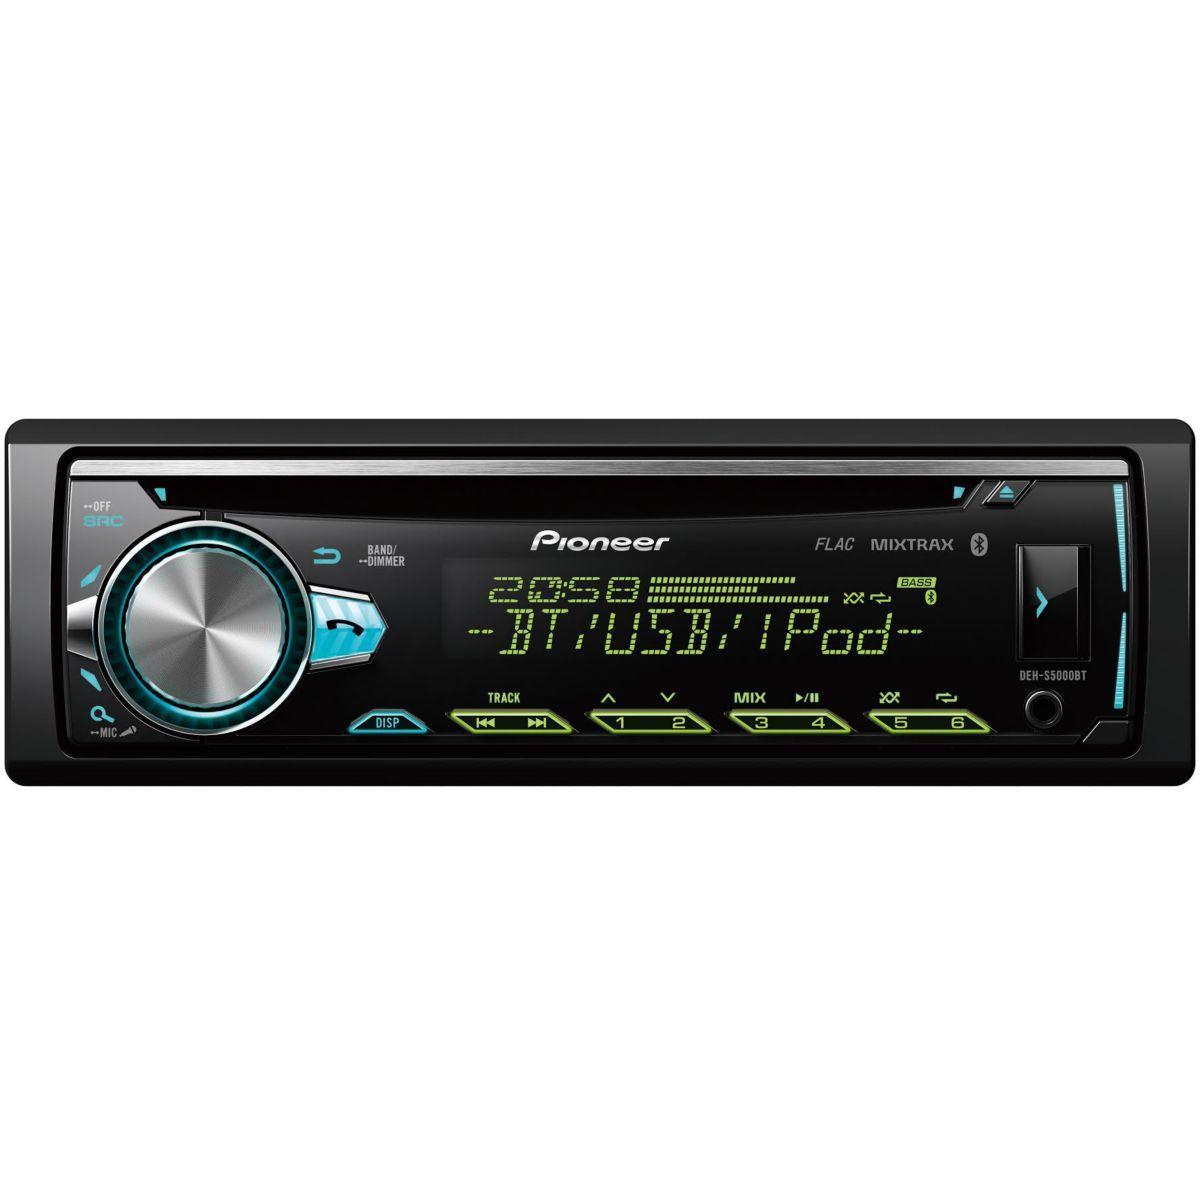 Auto-radio pioneer mixtrax cd usb ipod b - livraison offerte : code livprem